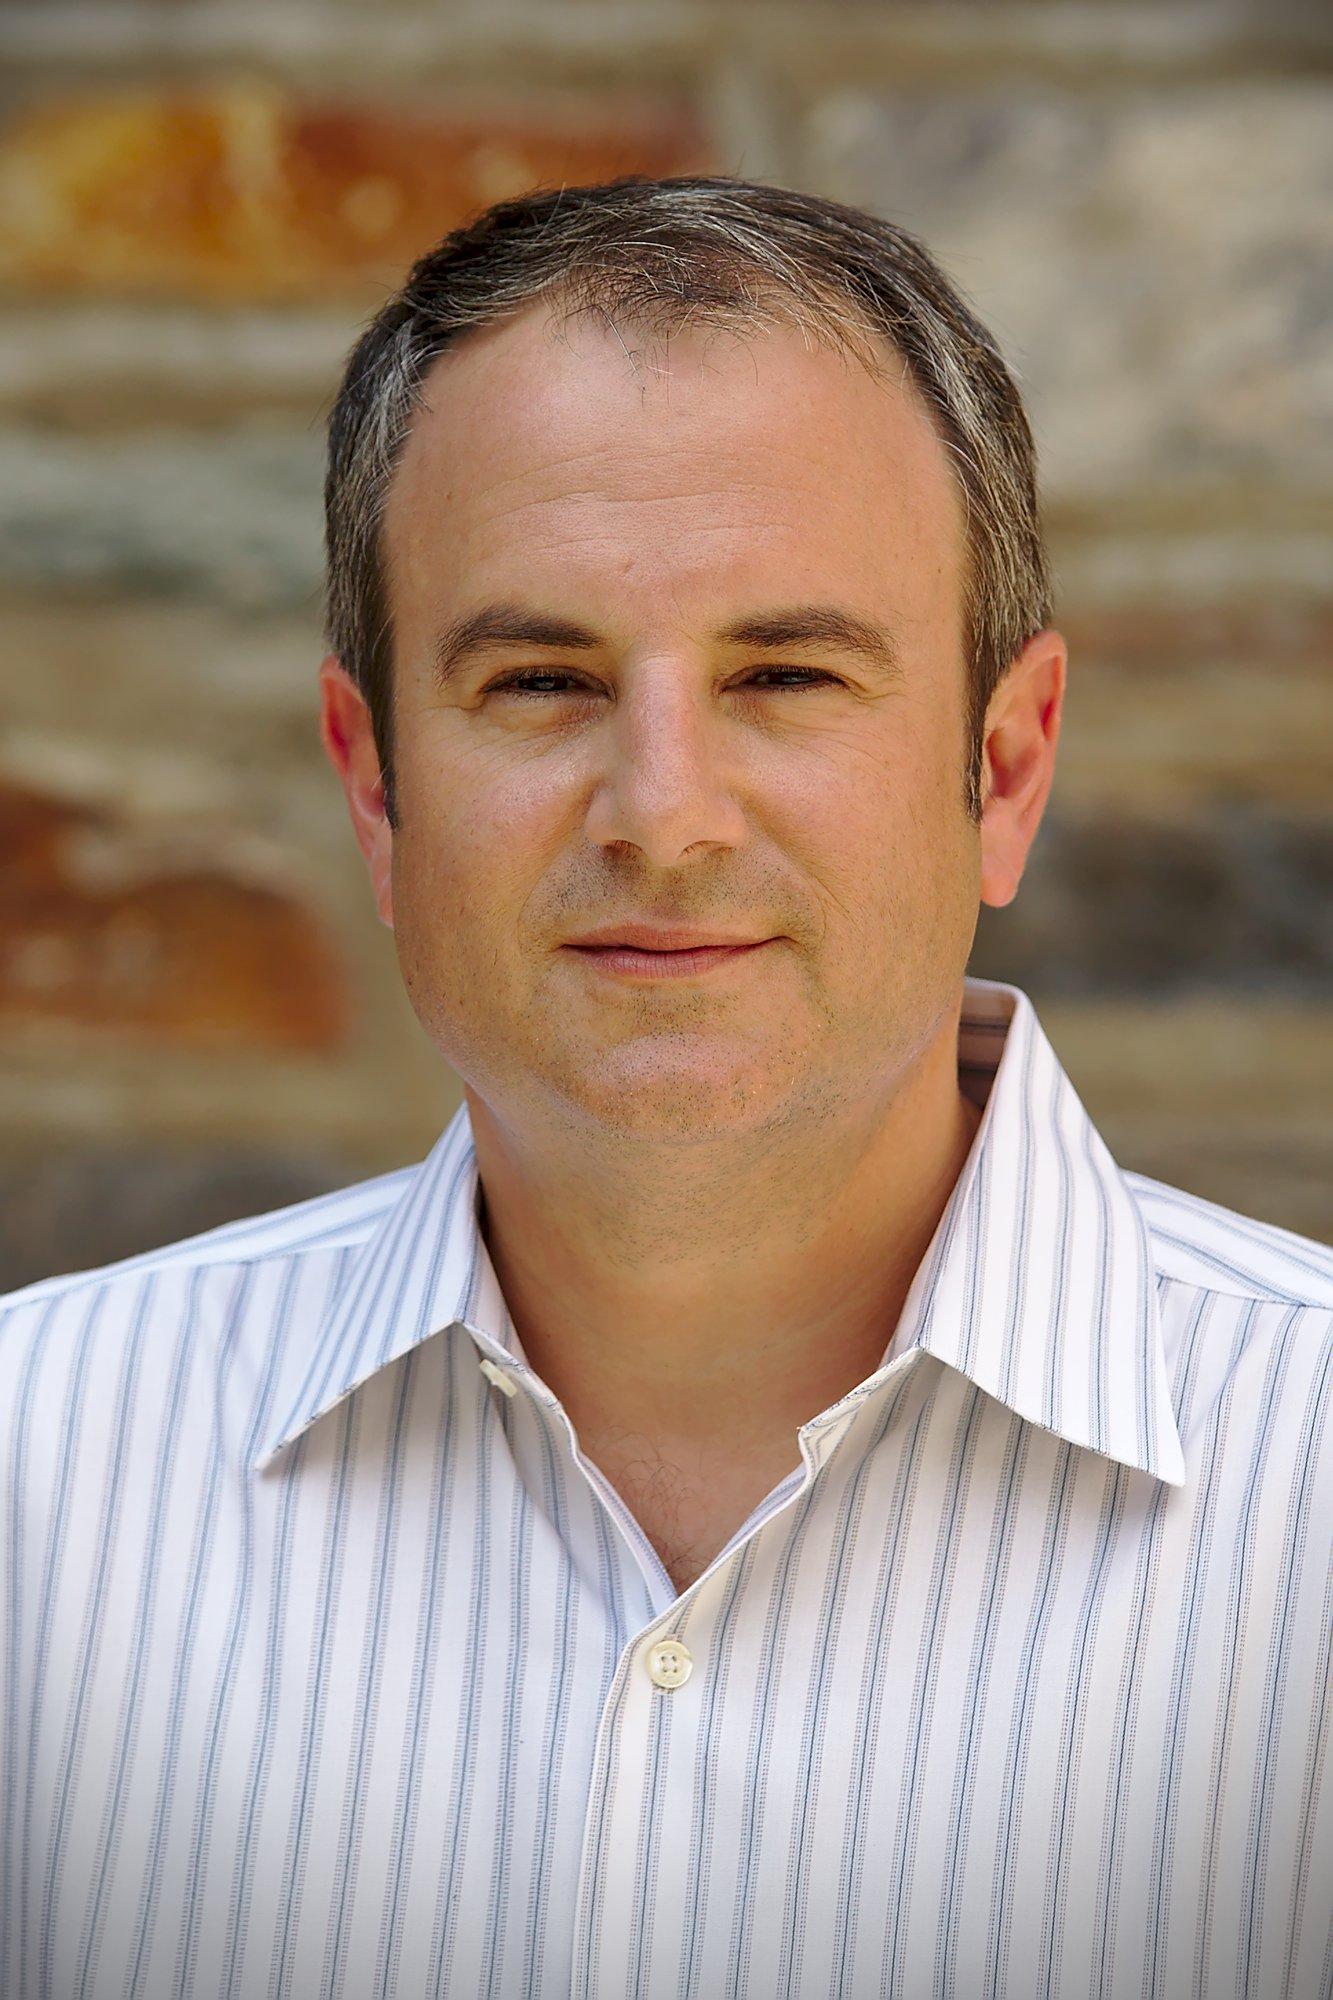 Adam Wax, Professor of Biomedical Engineering